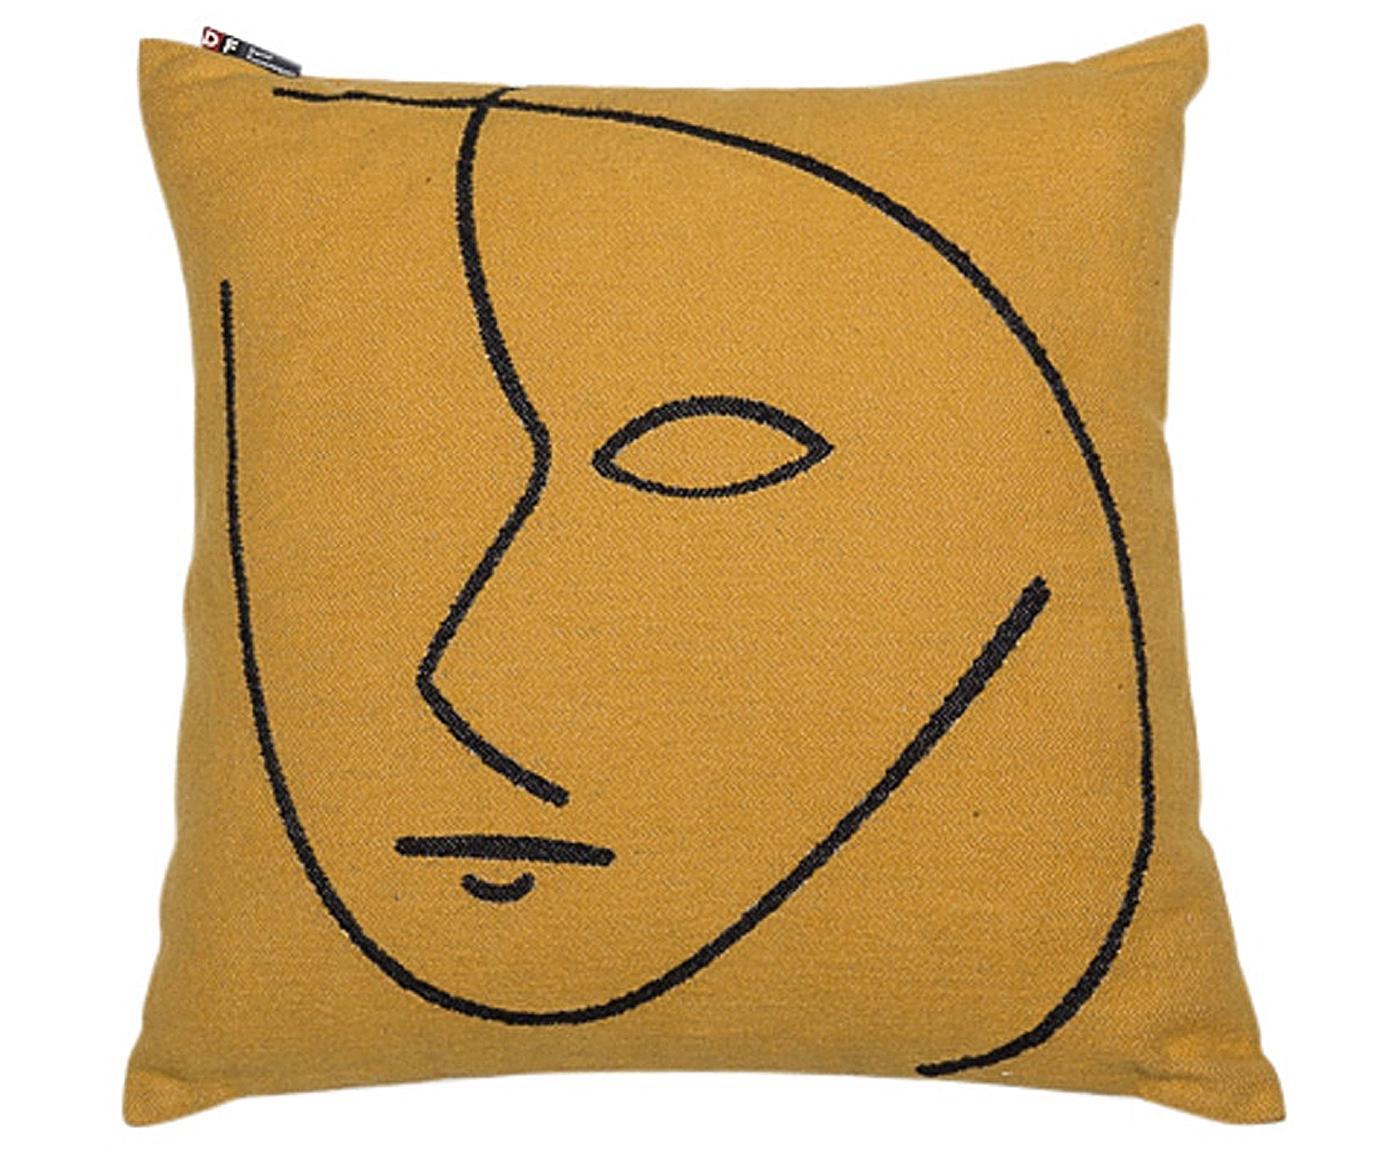 Kissenhülle Nova Face mit abstracktem Print, Bezug: 85% Baumwolle, 8% Viskose, Gelb, Schwarz, 50 x 50 cm